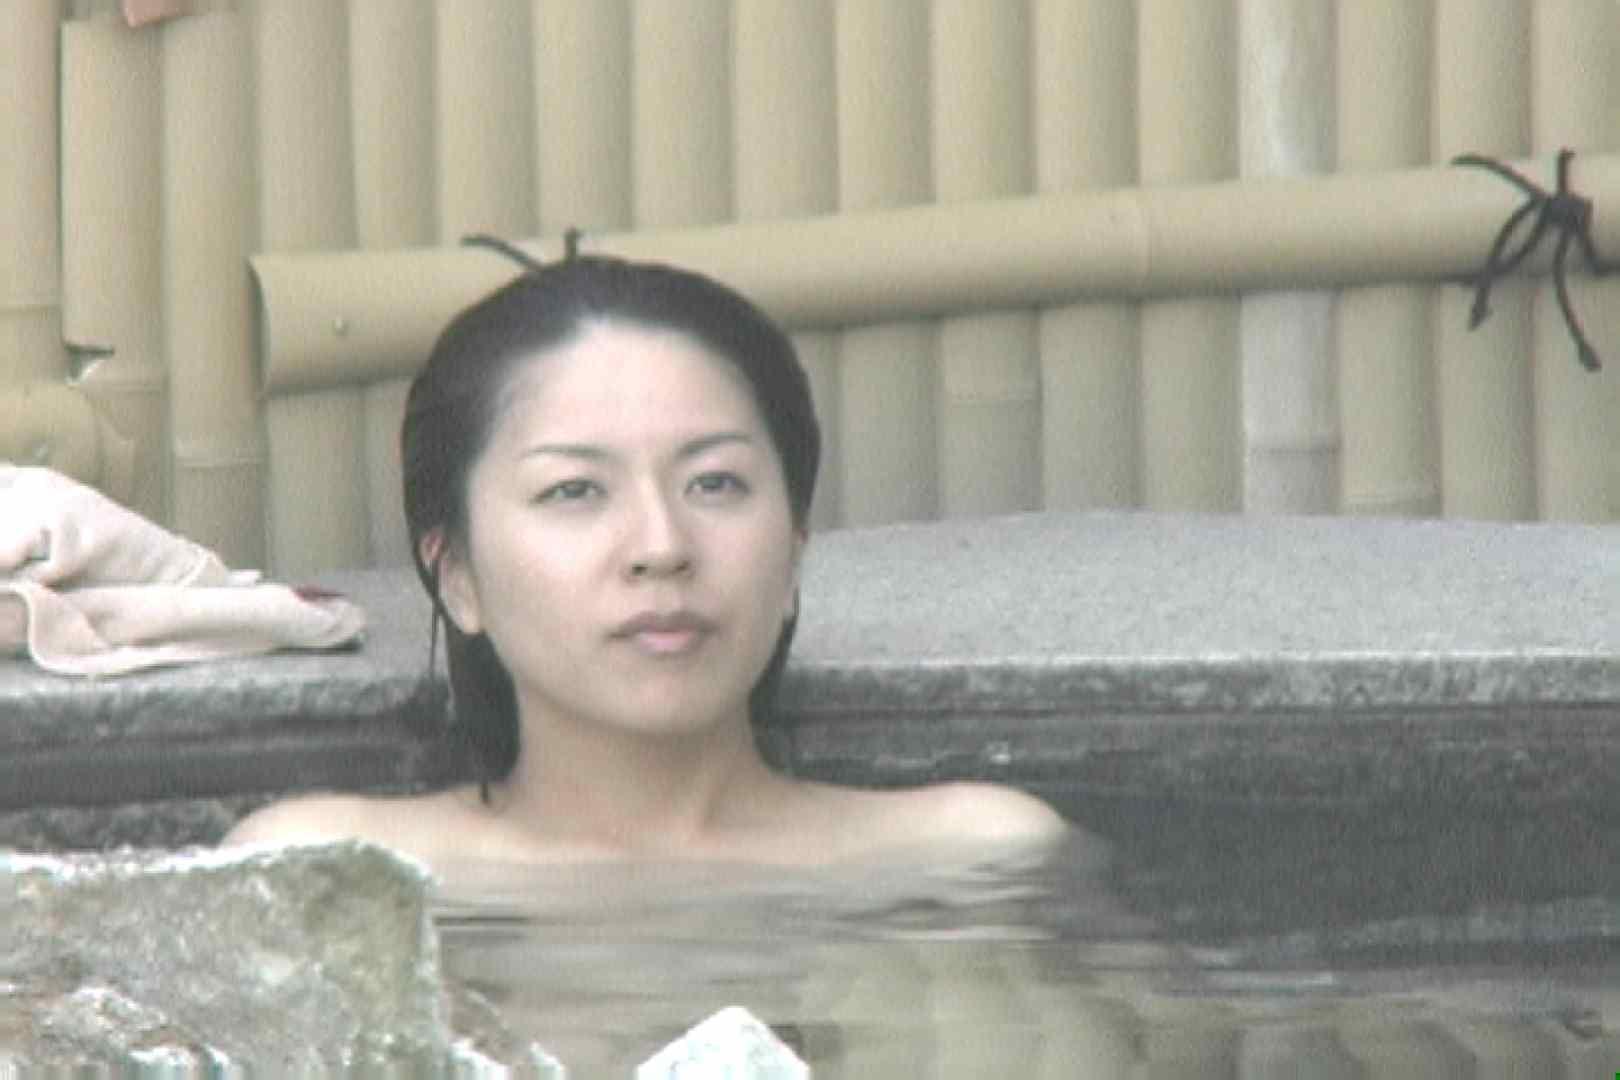 Aquaな露天風呂Vol.694 露天 オメコ無修正動画無料 110PICs 41